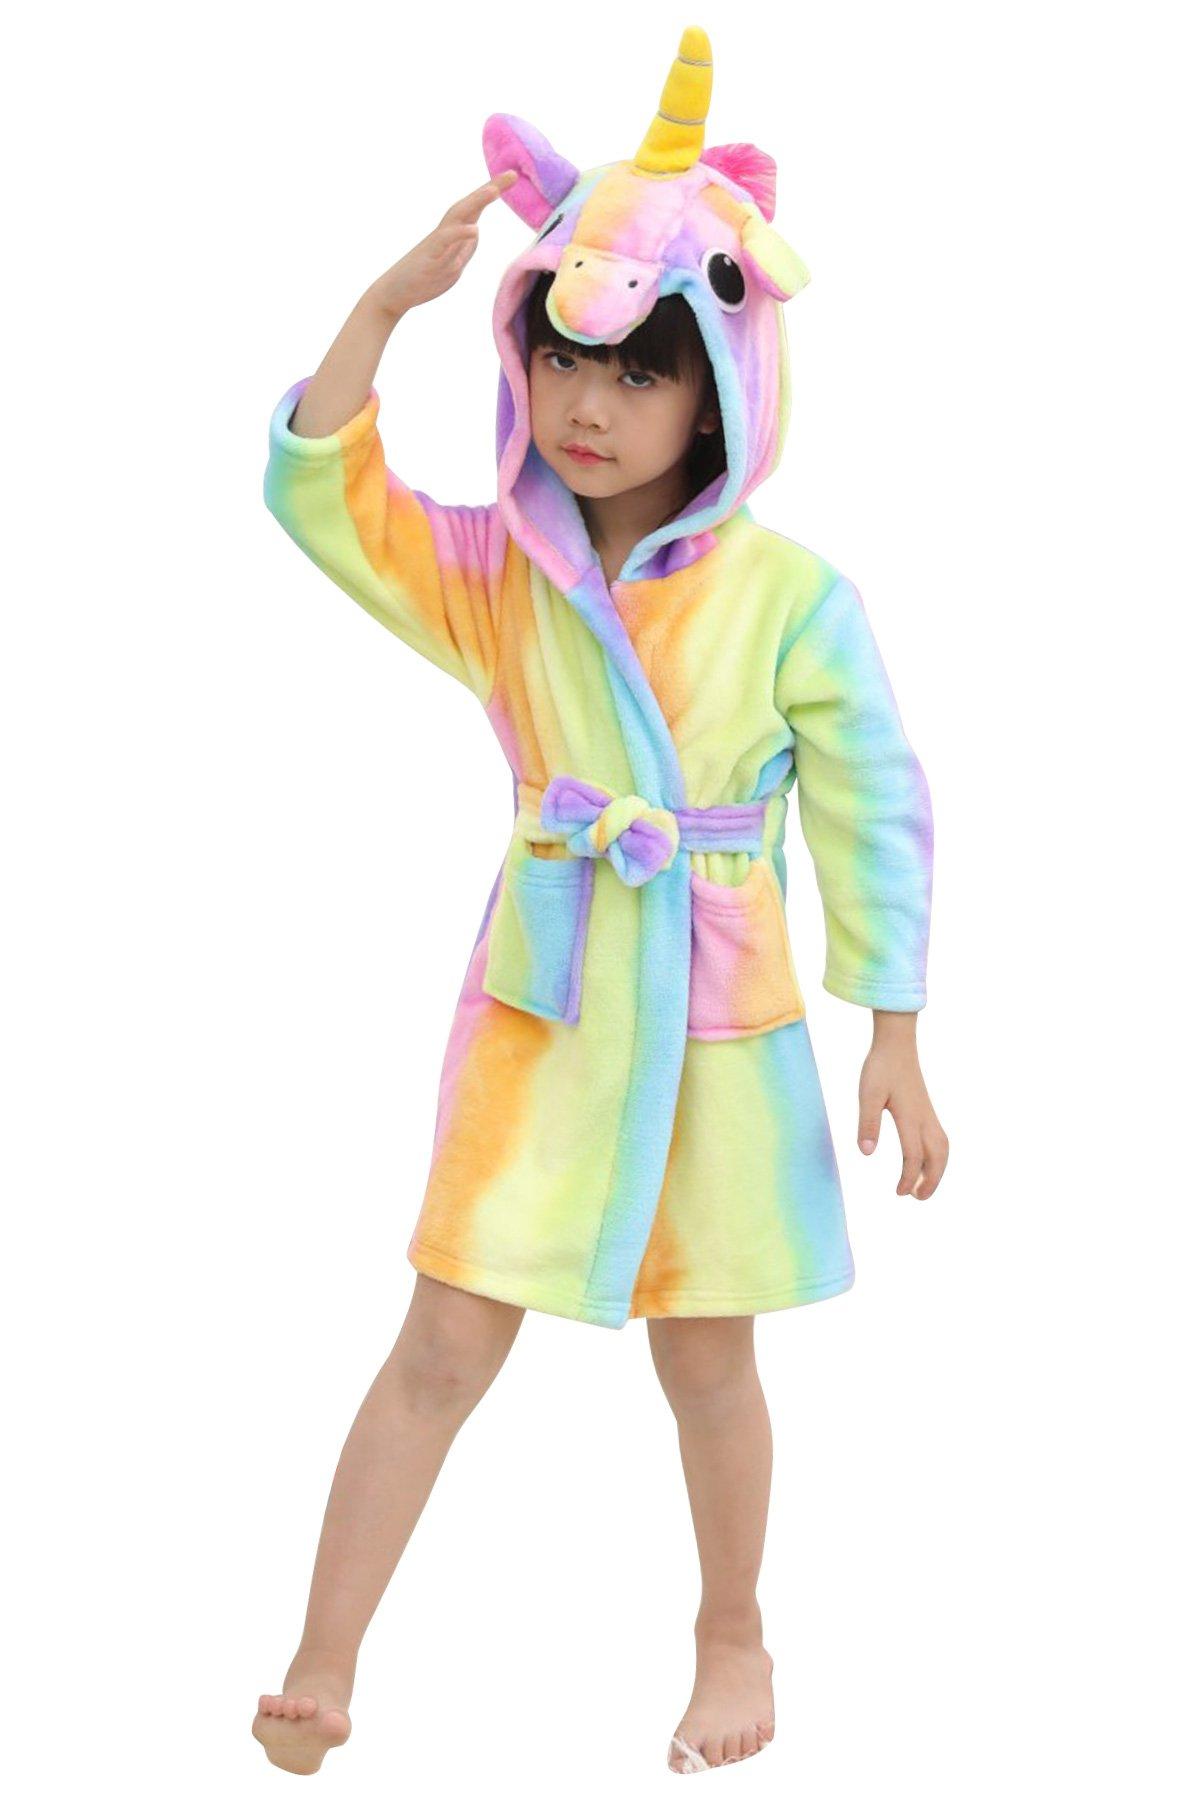 Lora Rossie Kids Soft Bathrobe Unicorn Hooded Bath Robe Flannel Sleepwear Comfy Pajamas Gift for Boys and Girls